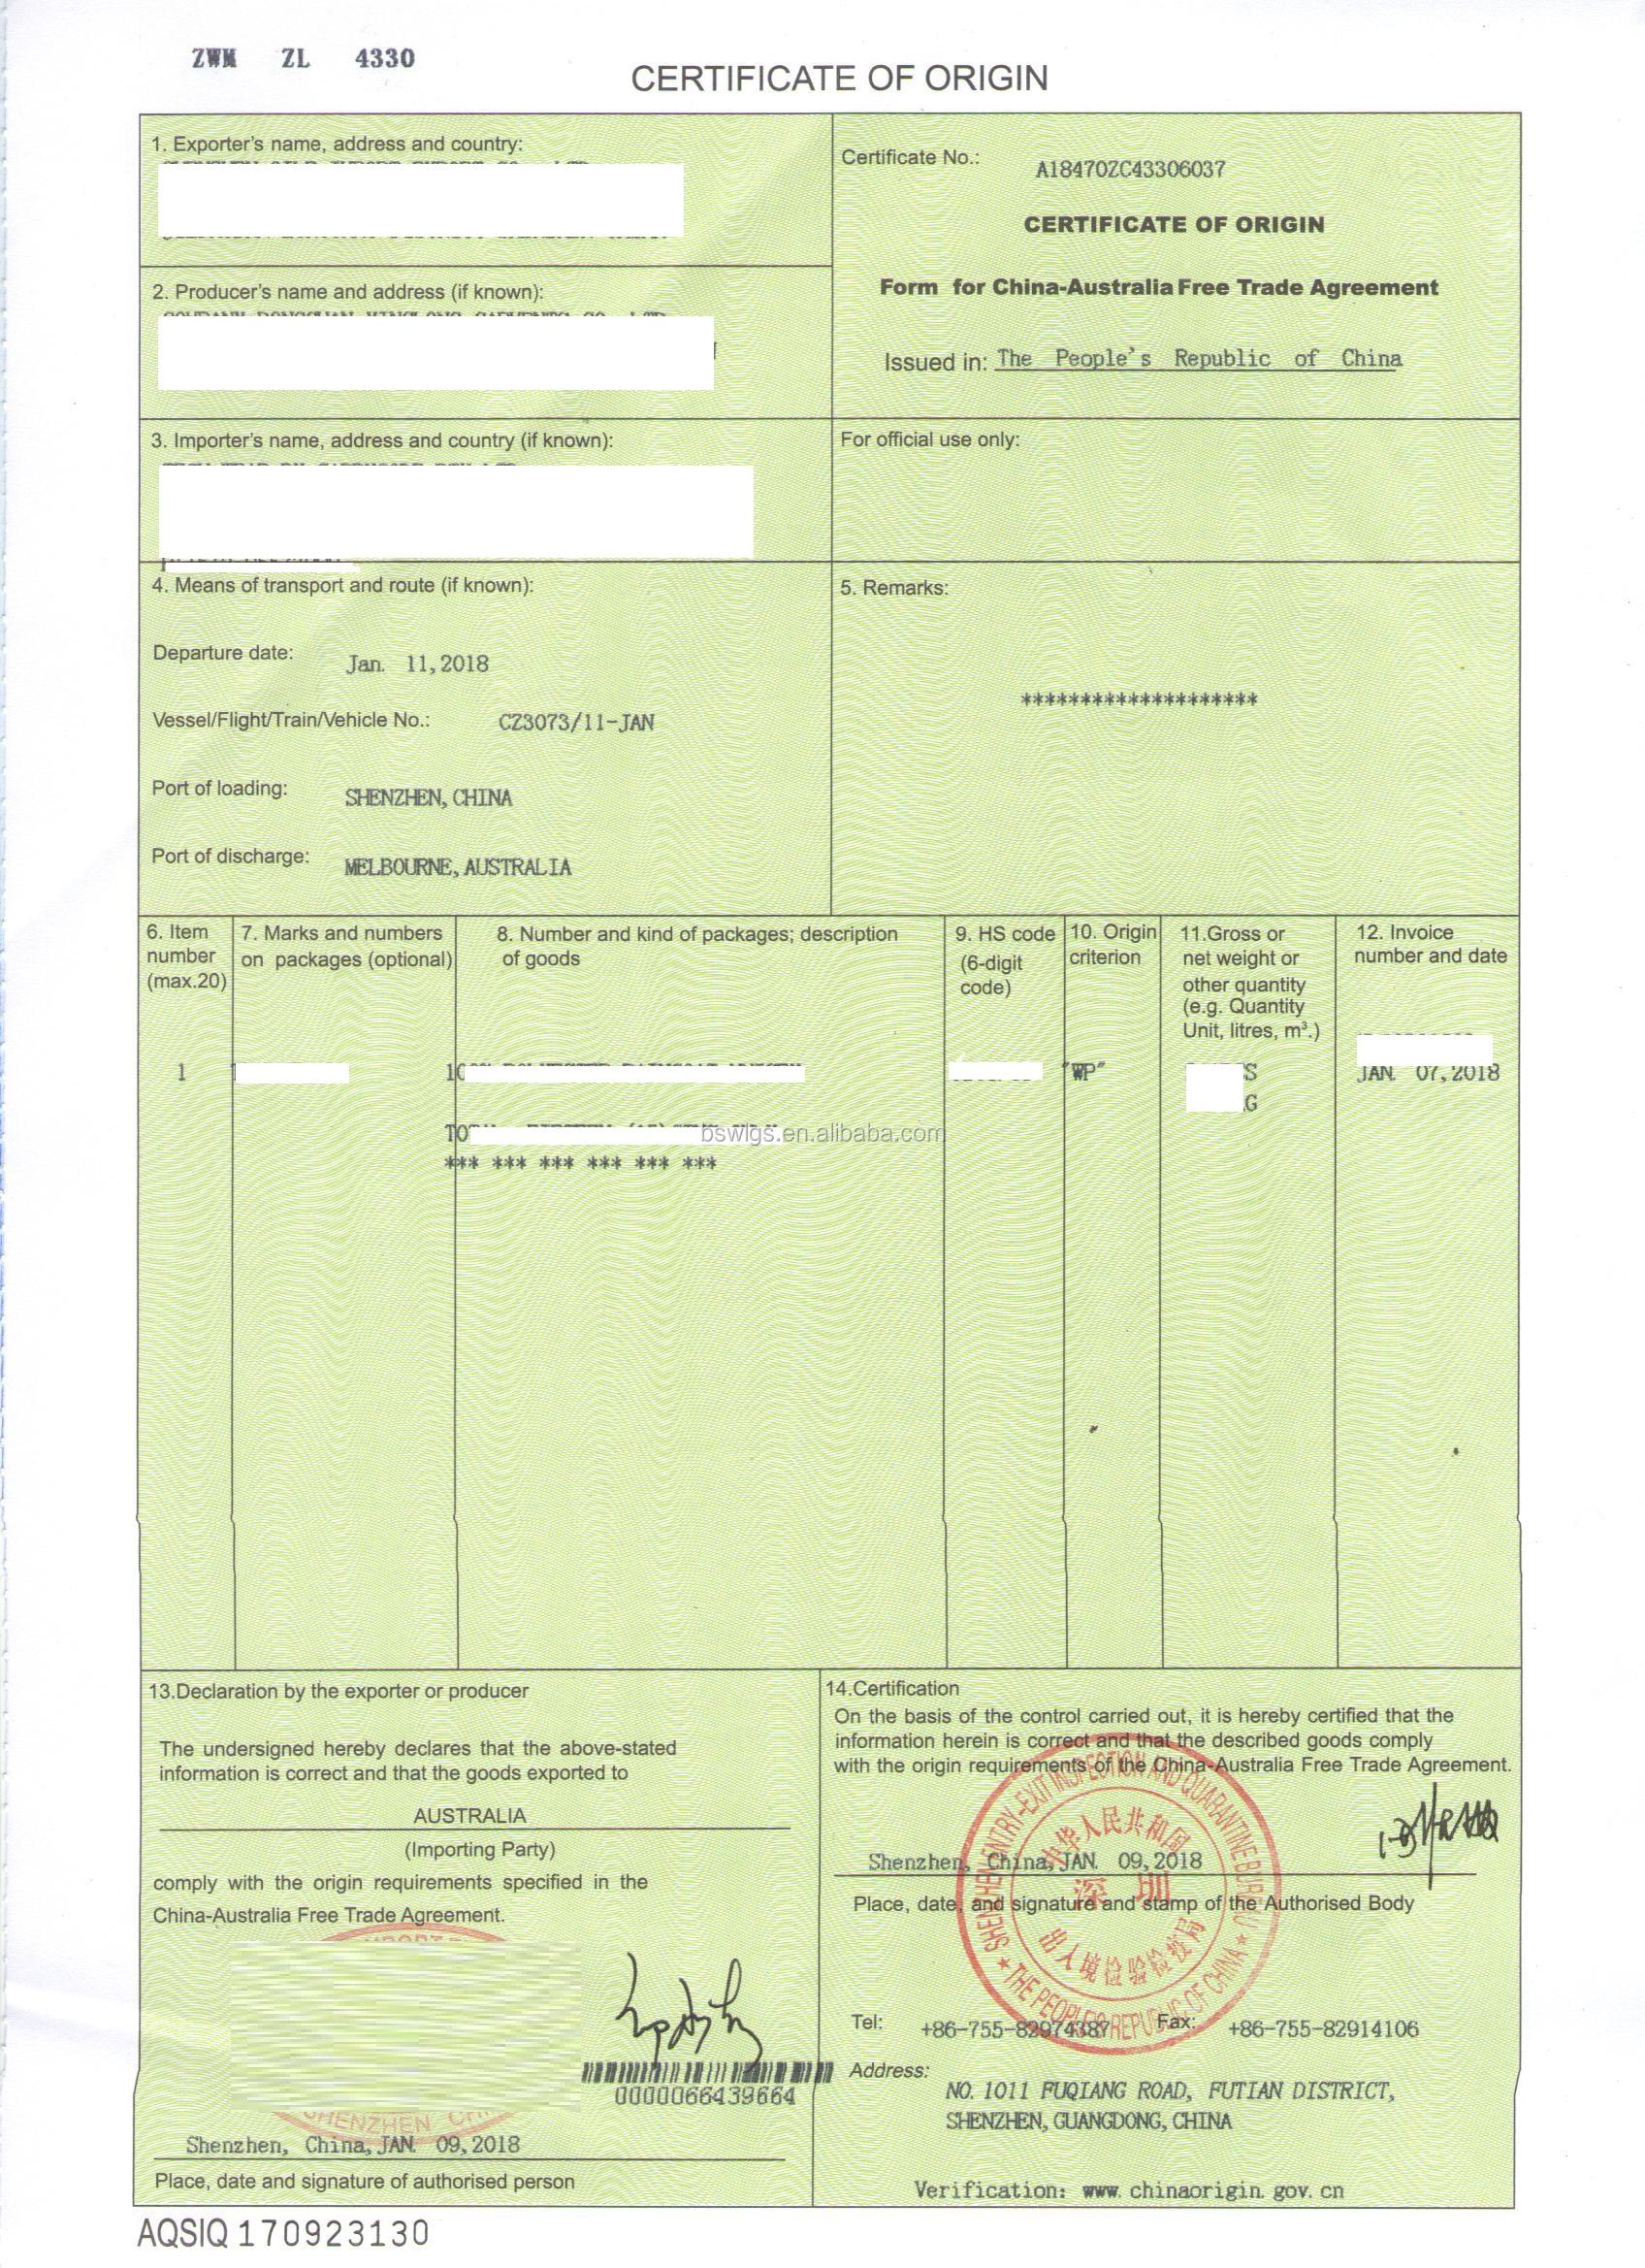 China Australia Free Trade Agreement Certificate Of Origin Form A